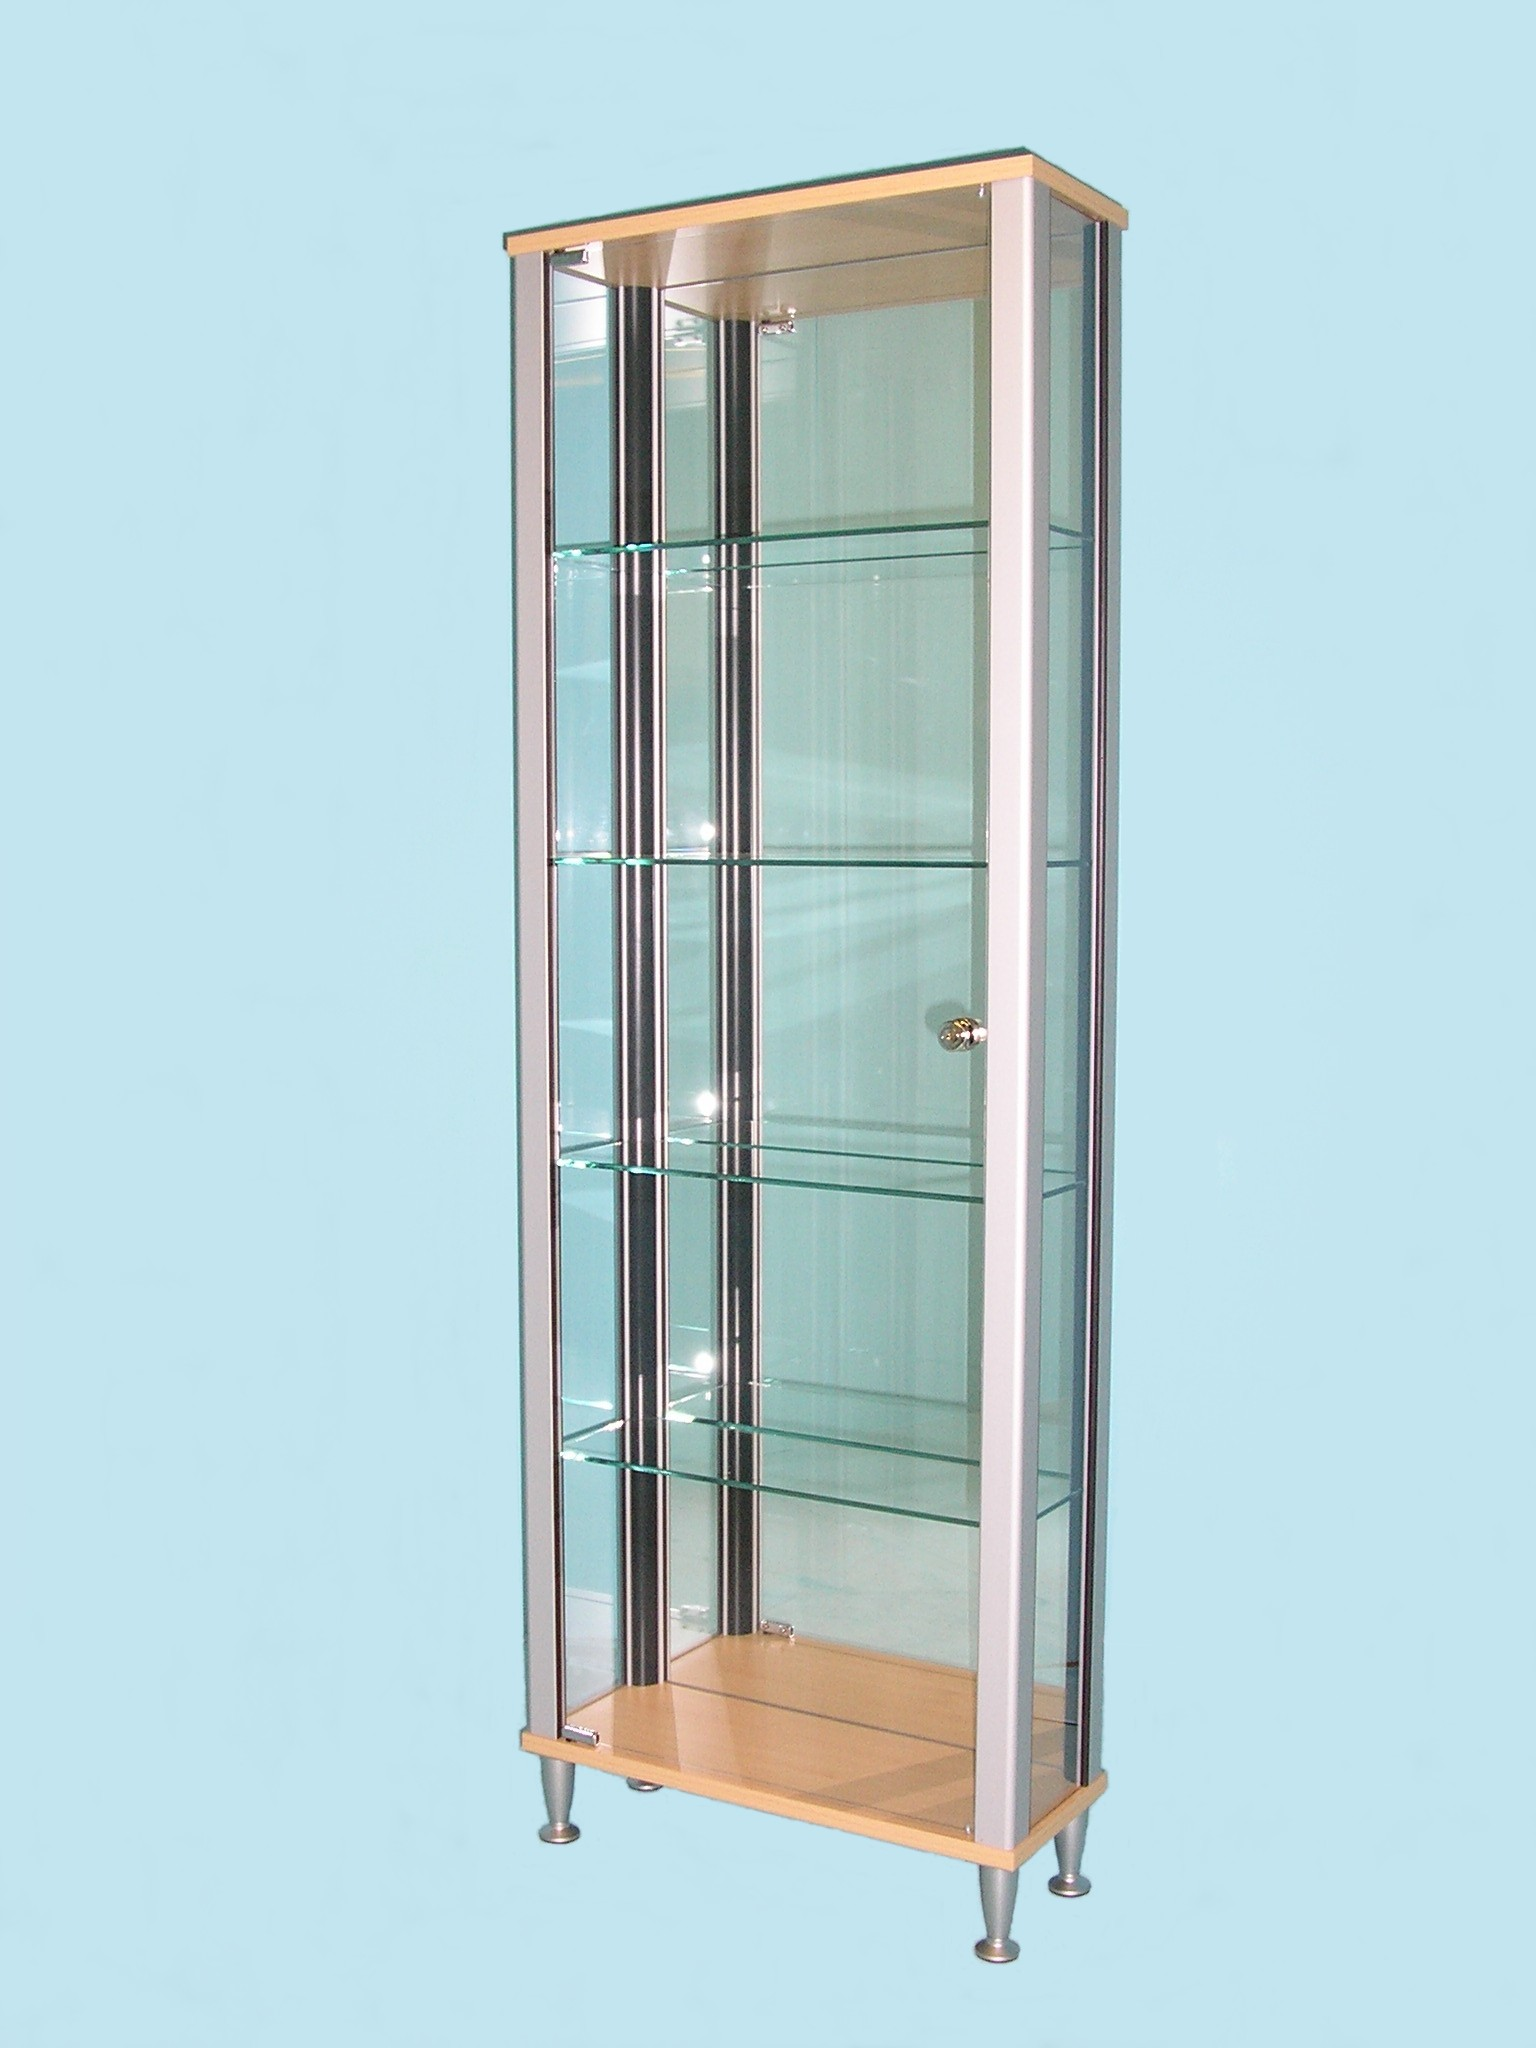 GLASS DISPLAY CABINETS, Designex cabinets, D61 Slimline Cabinet